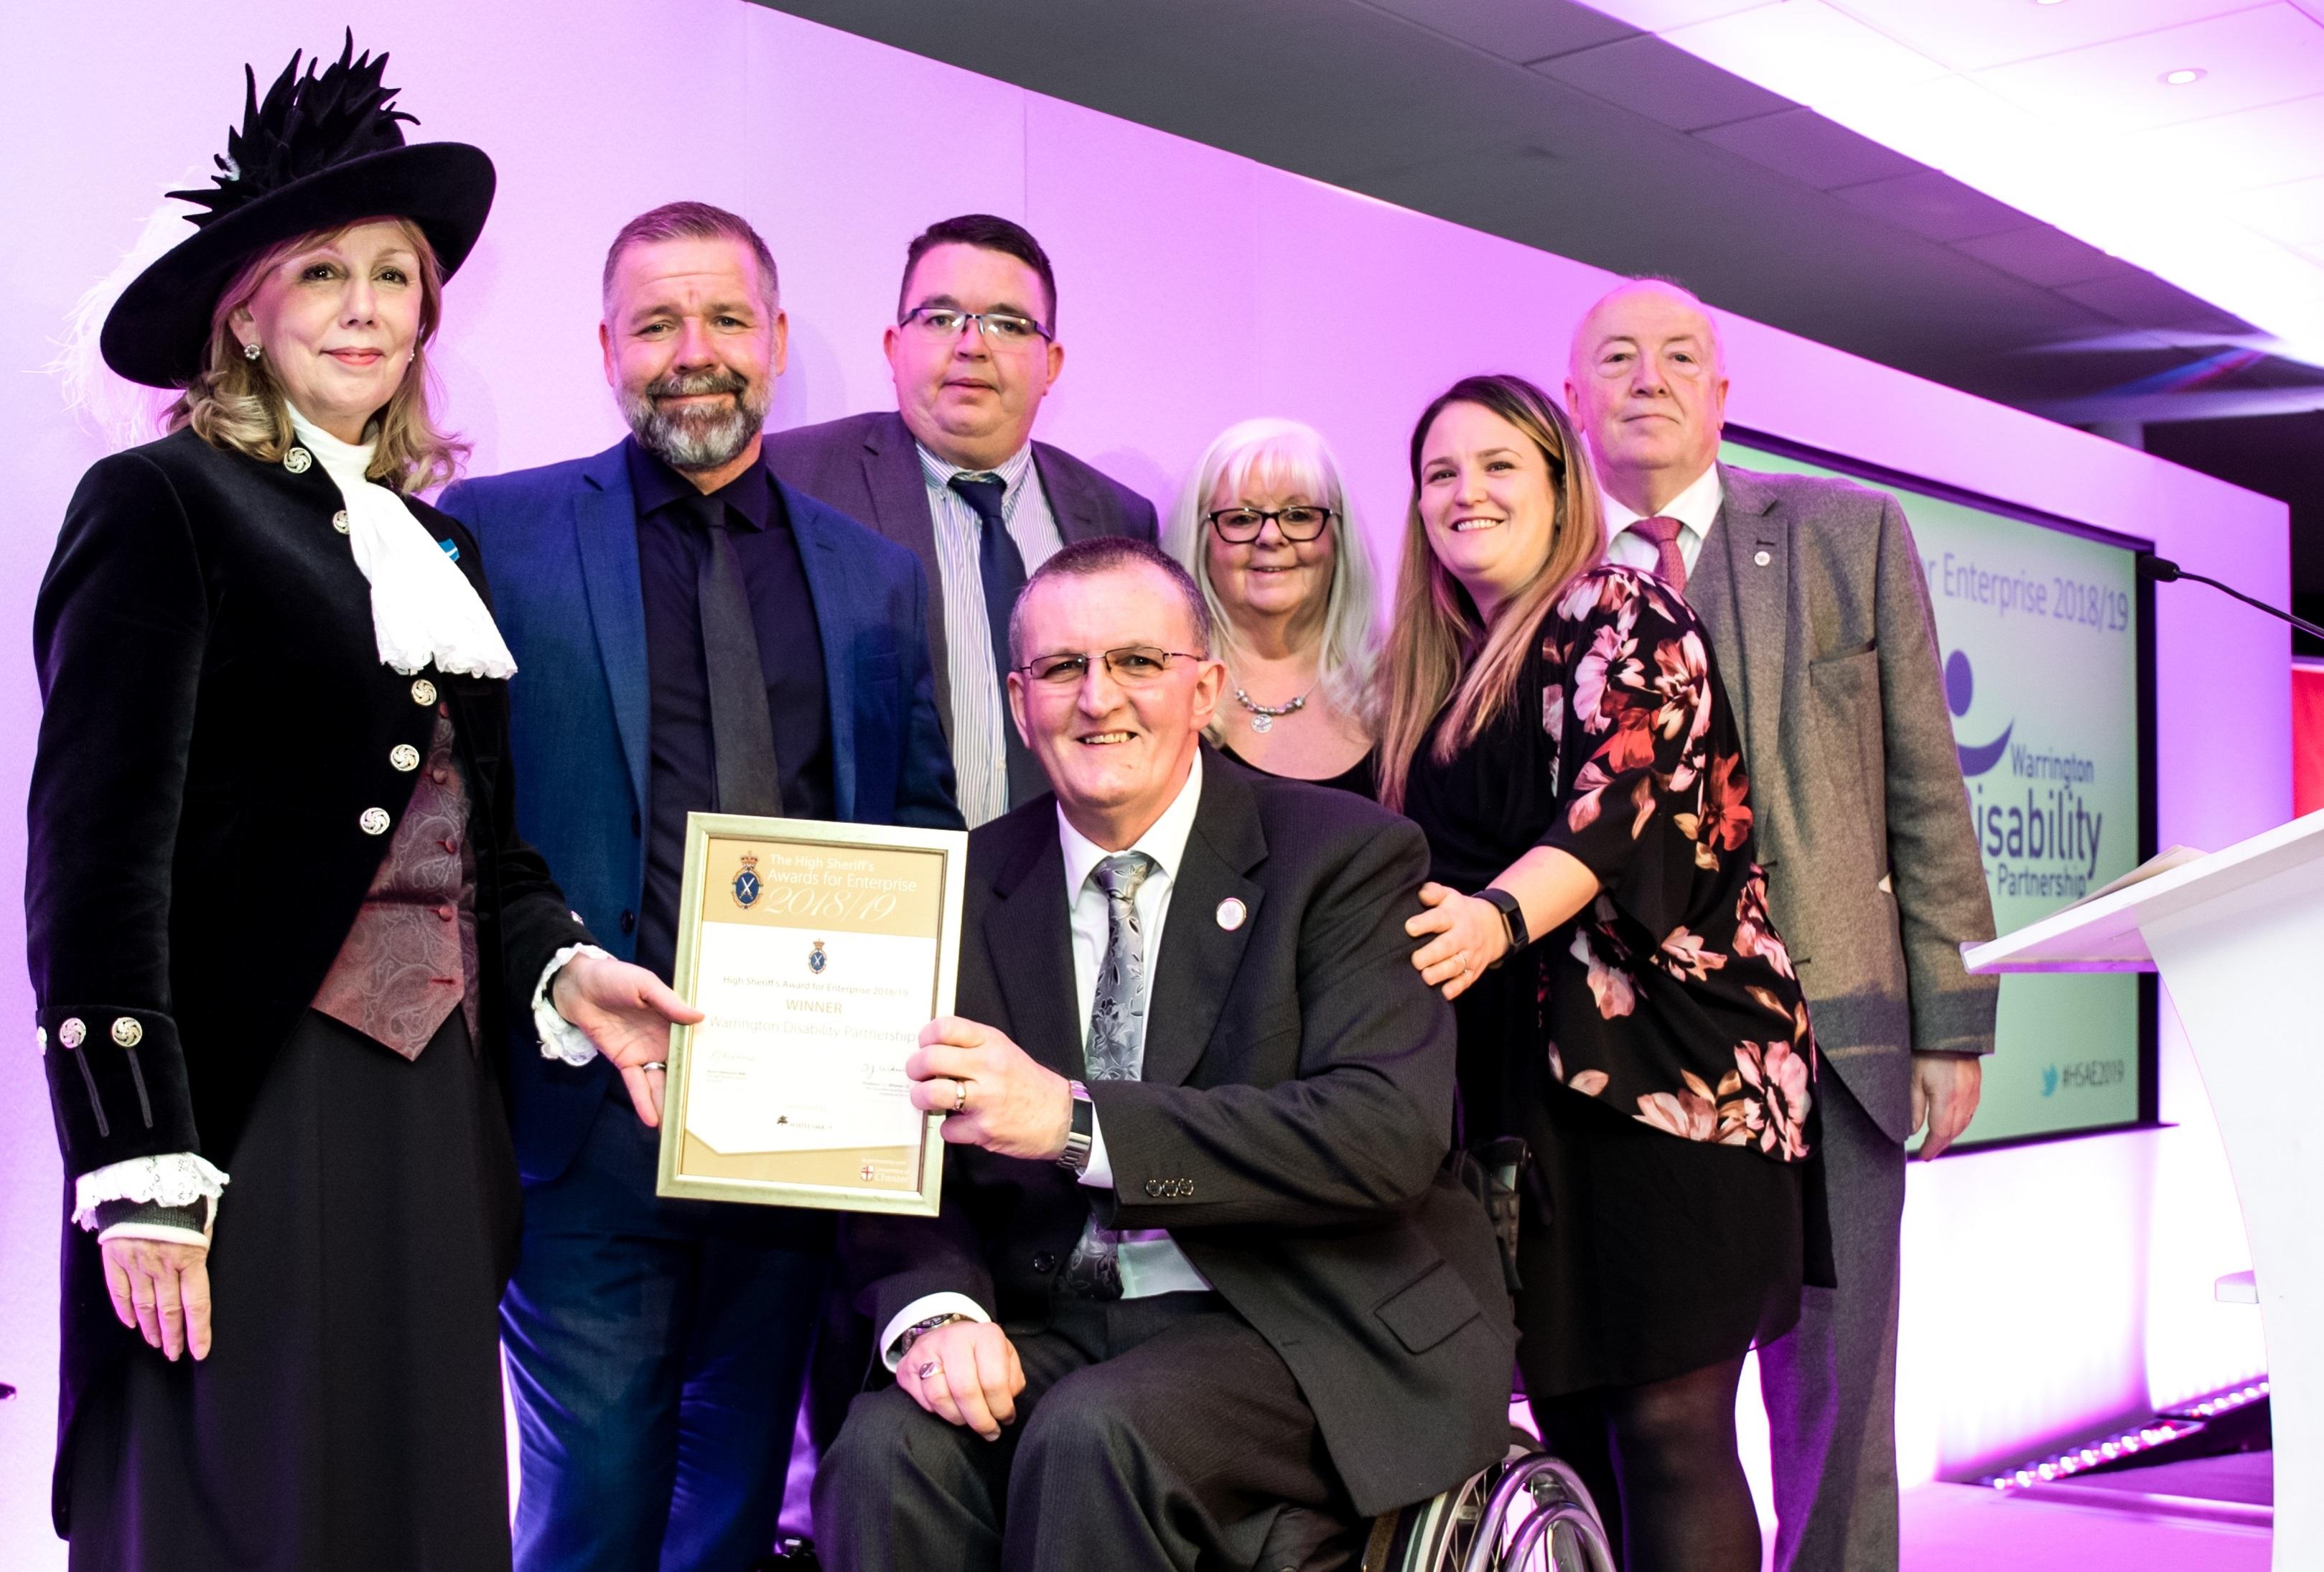 c1ab09ef146 The High Sheriff's Awards for Enterprise - winners announced   Press ...